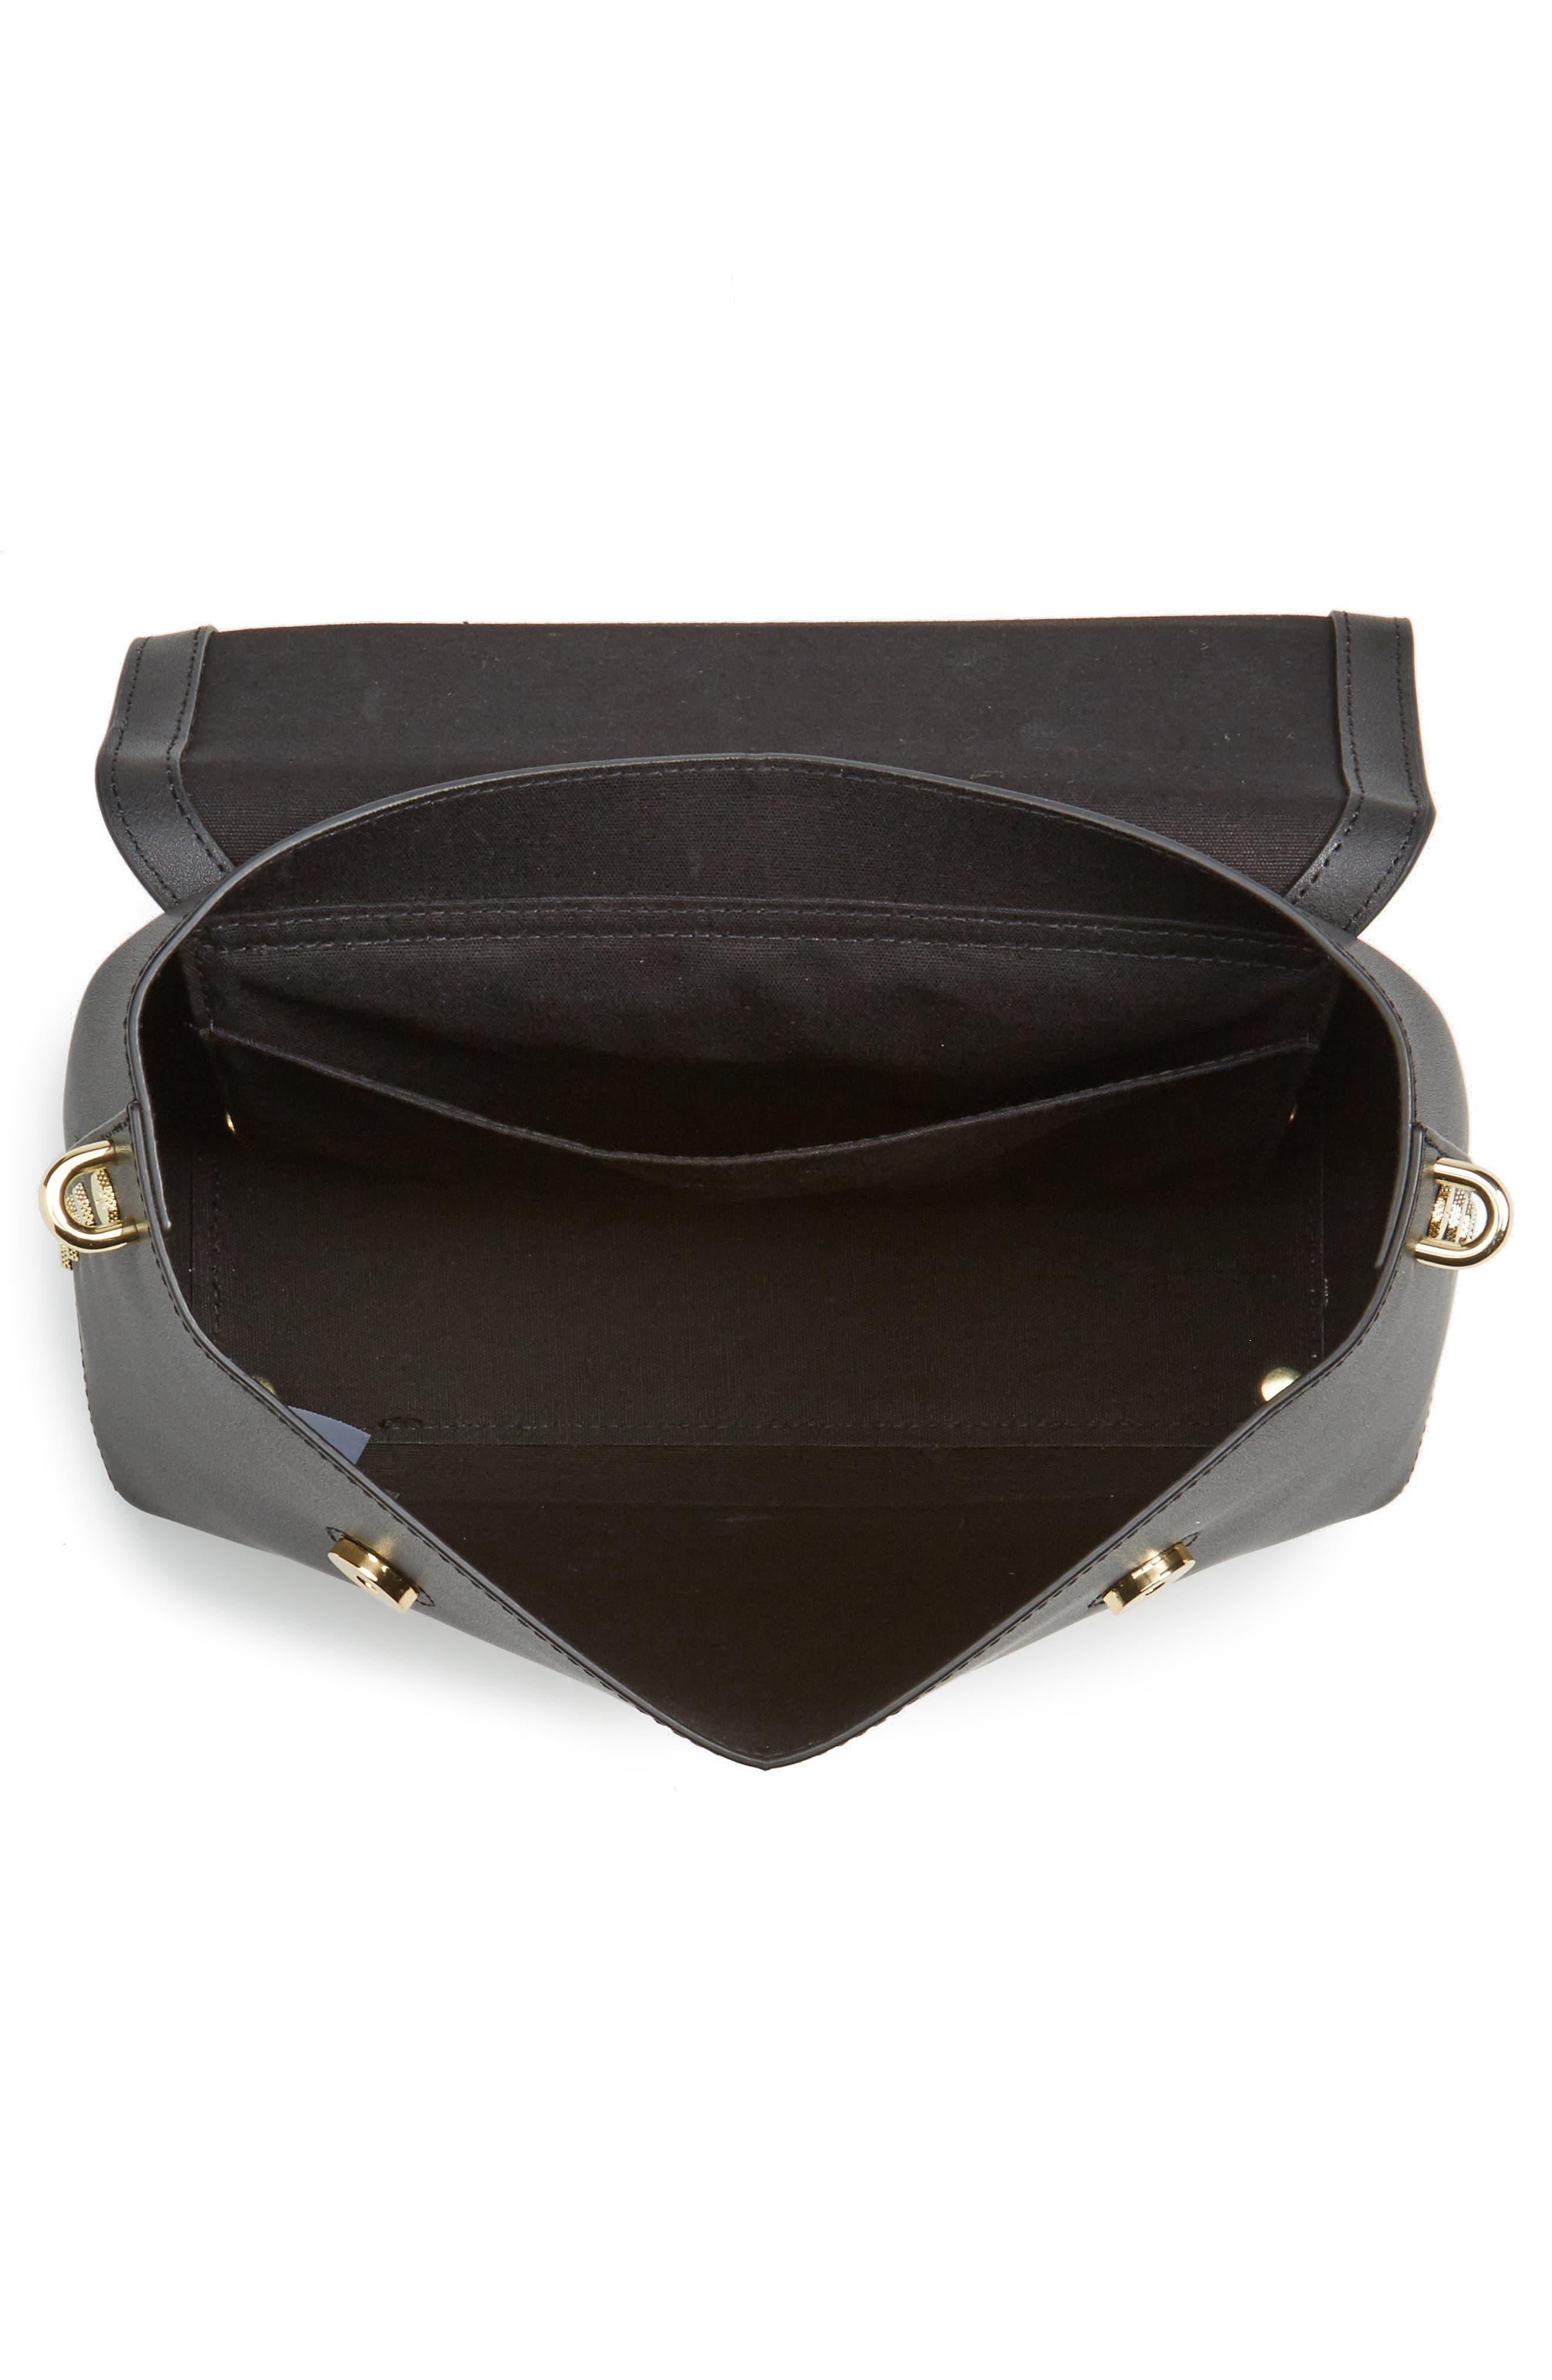 Taymar - Studded Edge Lady Bag Leather Top Handle Satchel,                             Alternate thumbnail 4, color,                             001